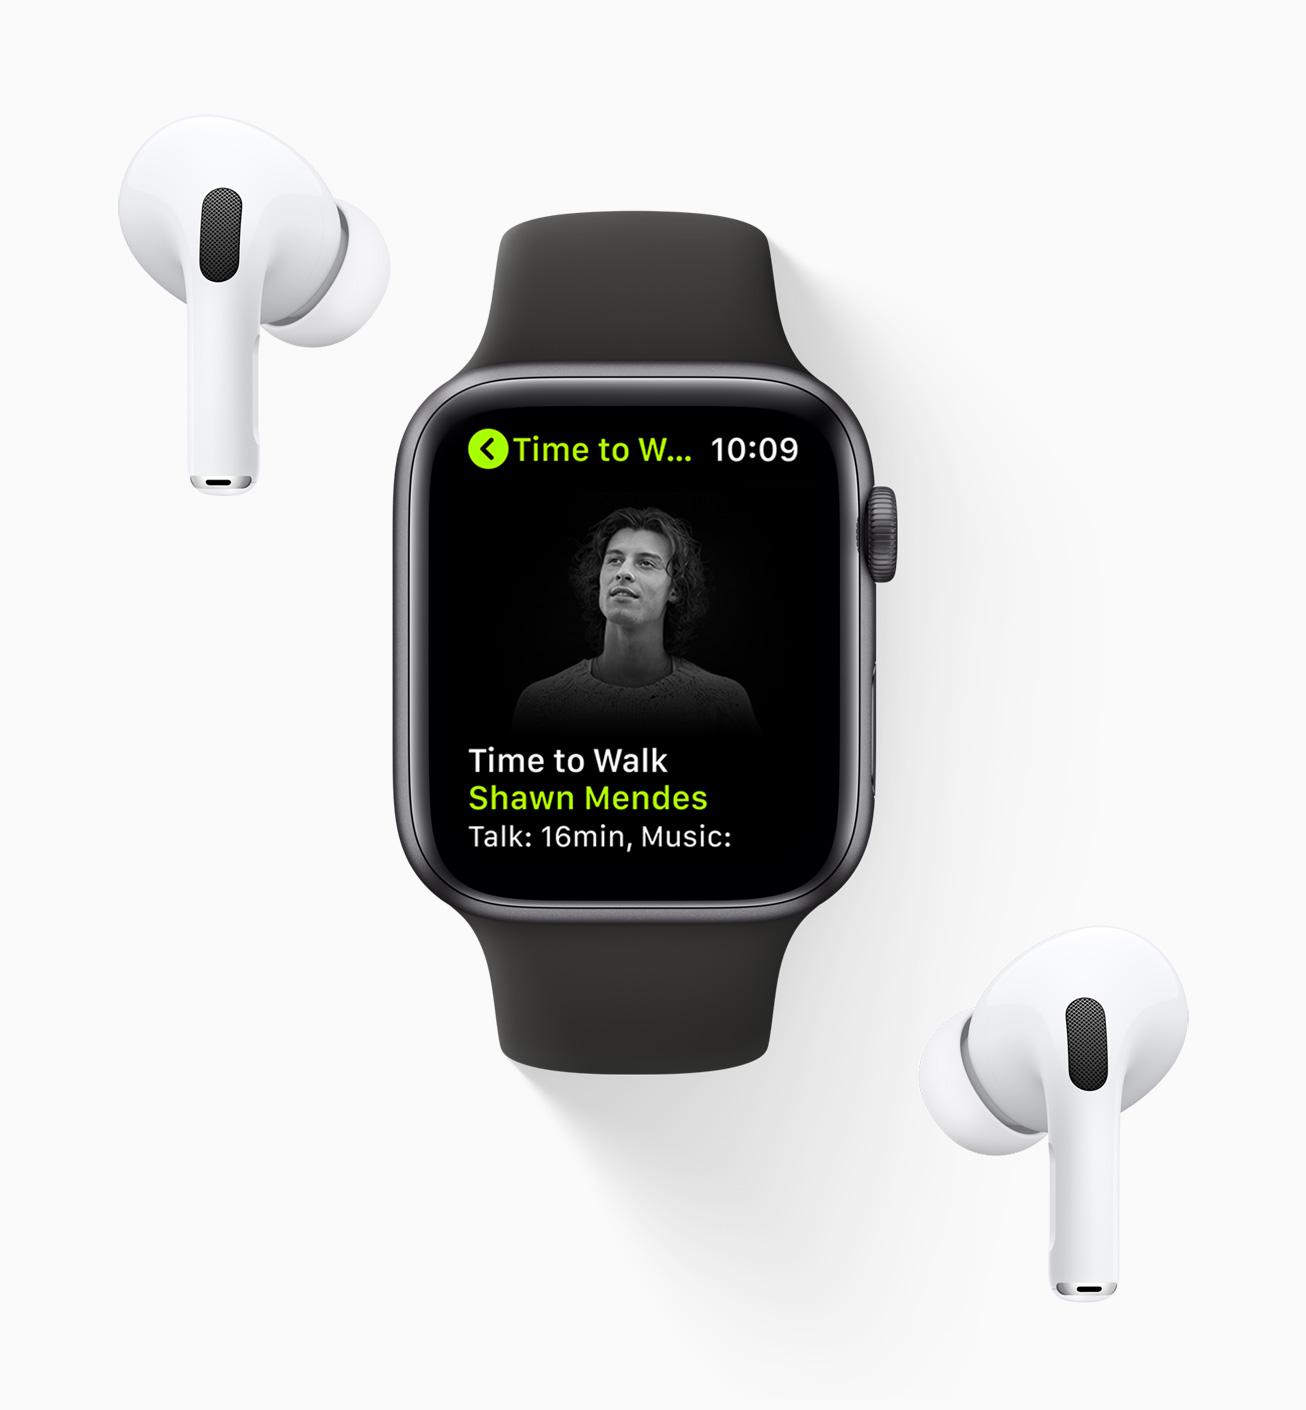 apple_time-to-walk_apple-watch-airpods_01252021_inline.jpg.large_2x.jpg